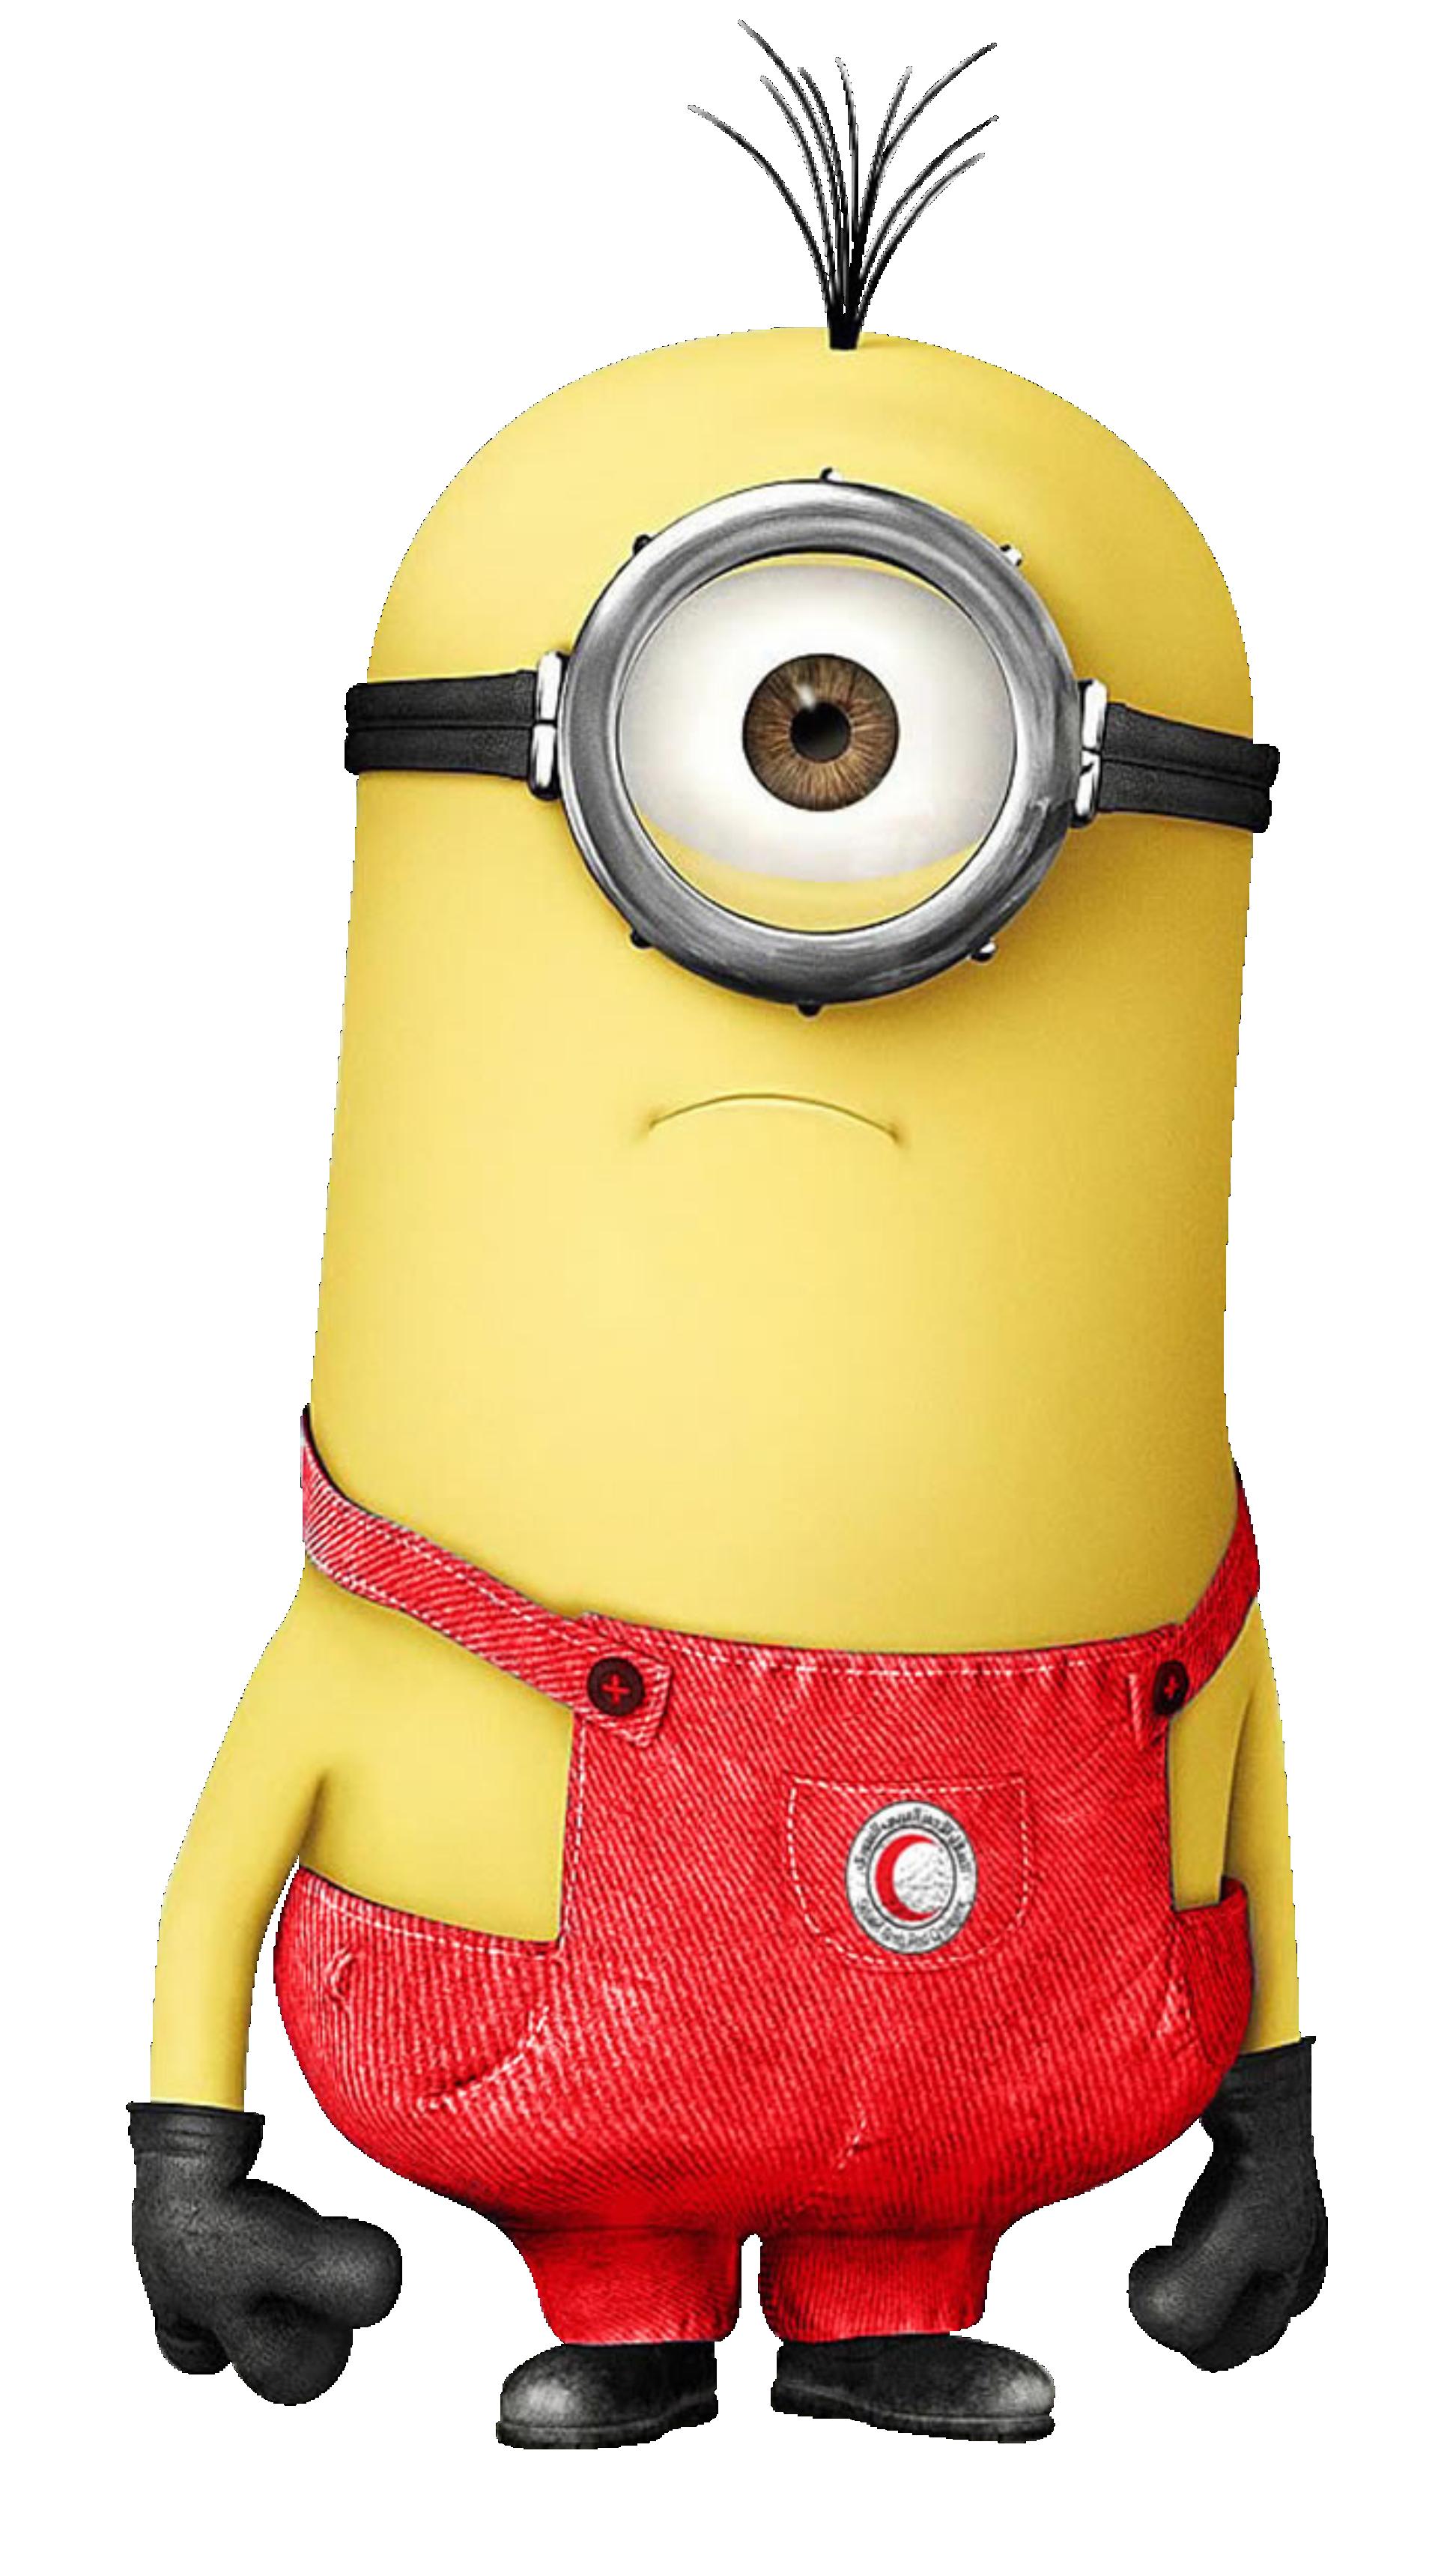 Meu Malvado Favorito - Minions Phil Vermelho, evil favorite – minions, favorito del mal – minions, böser Favorit - Günstlinge